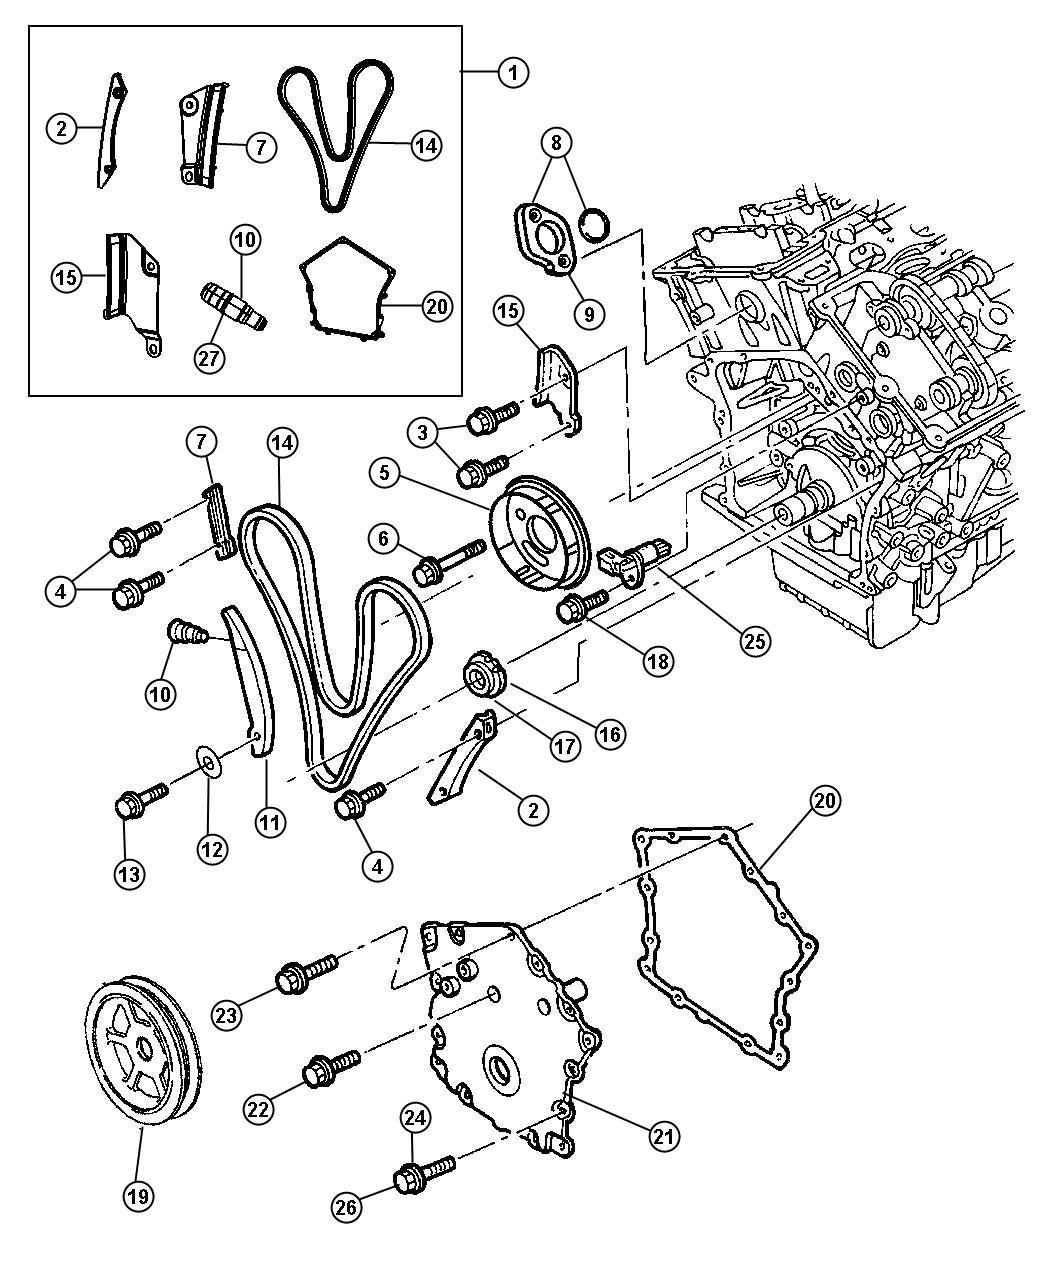 tags: #dodge 360 engine diagram#jeep engine diagram#gm 350 engine diagram#jeep  360 engine diagram#dodge 360 motor diagram#jeep cherokee engine parts#dodge